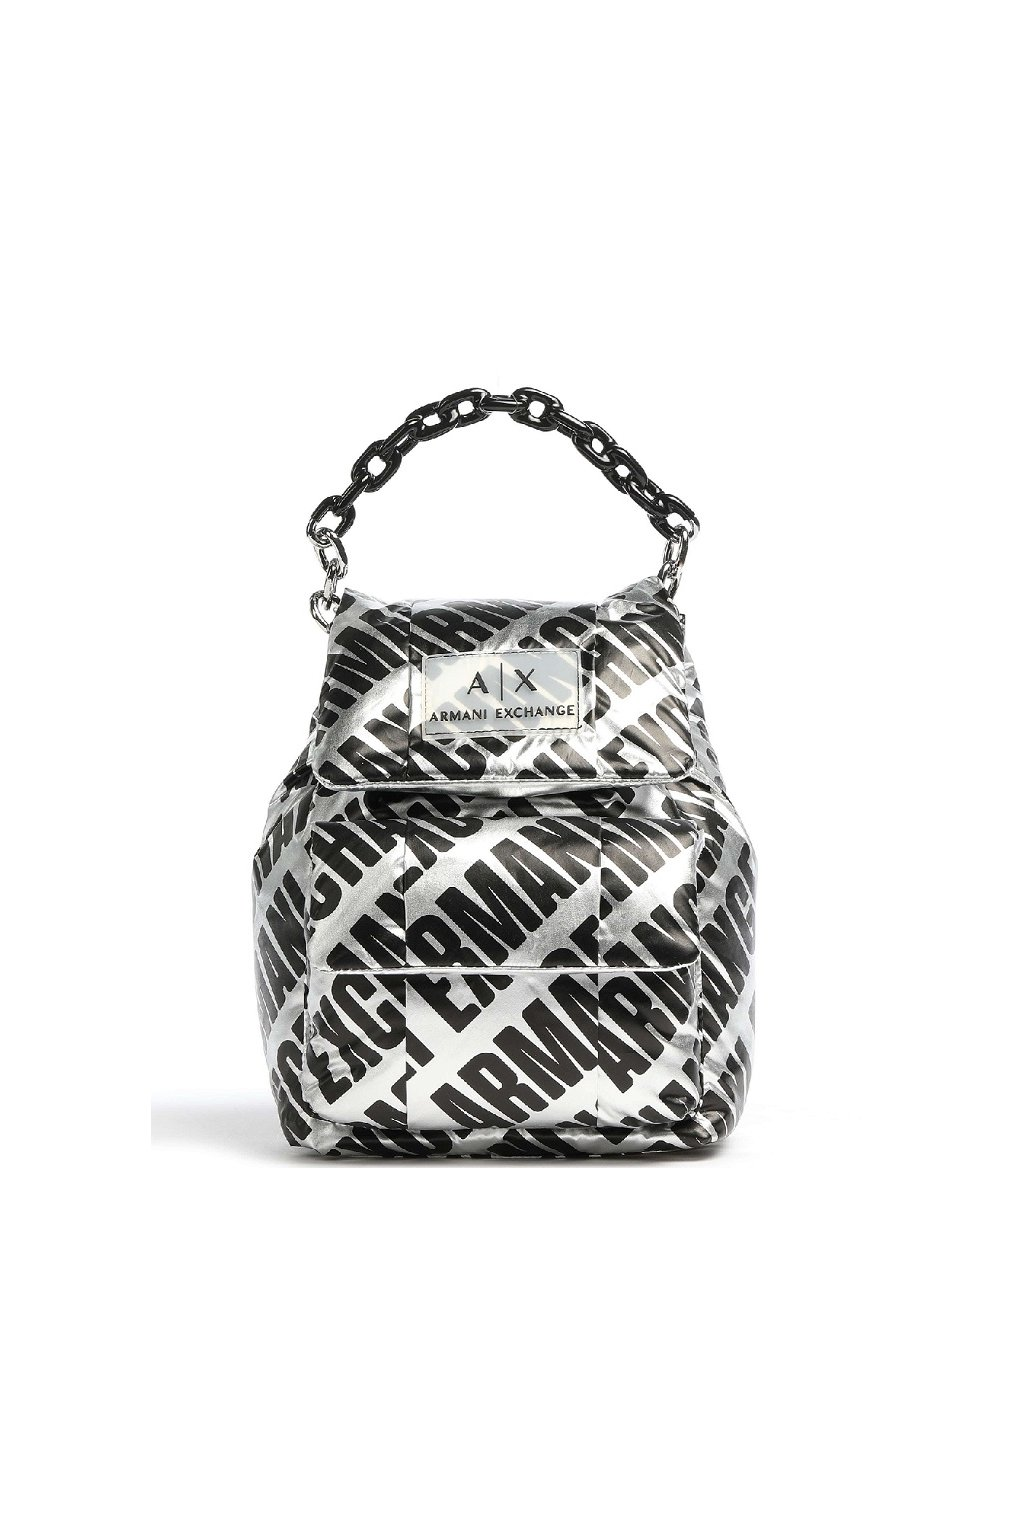 942668 0A842 04117 Dámský batoh Armani Exchange stříbrný